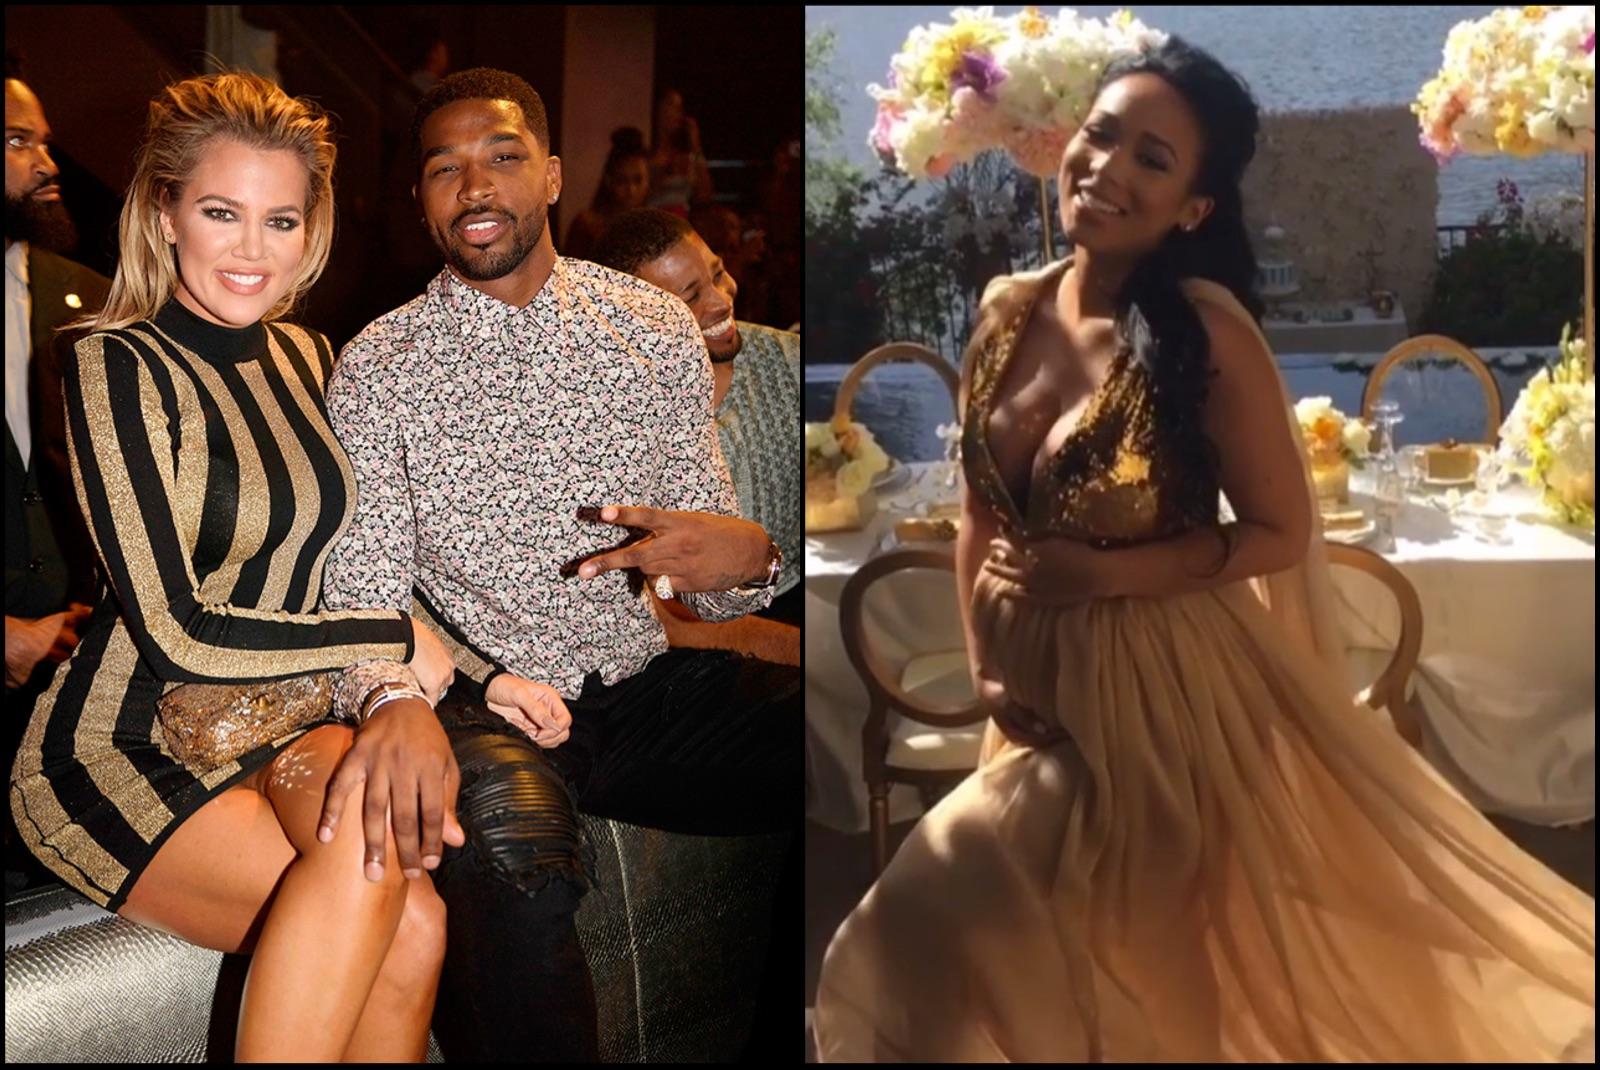 Khloe Kardashian Slams Haters Who Claim She Stole Tristan Thompson From His Ex, Jordan Craig